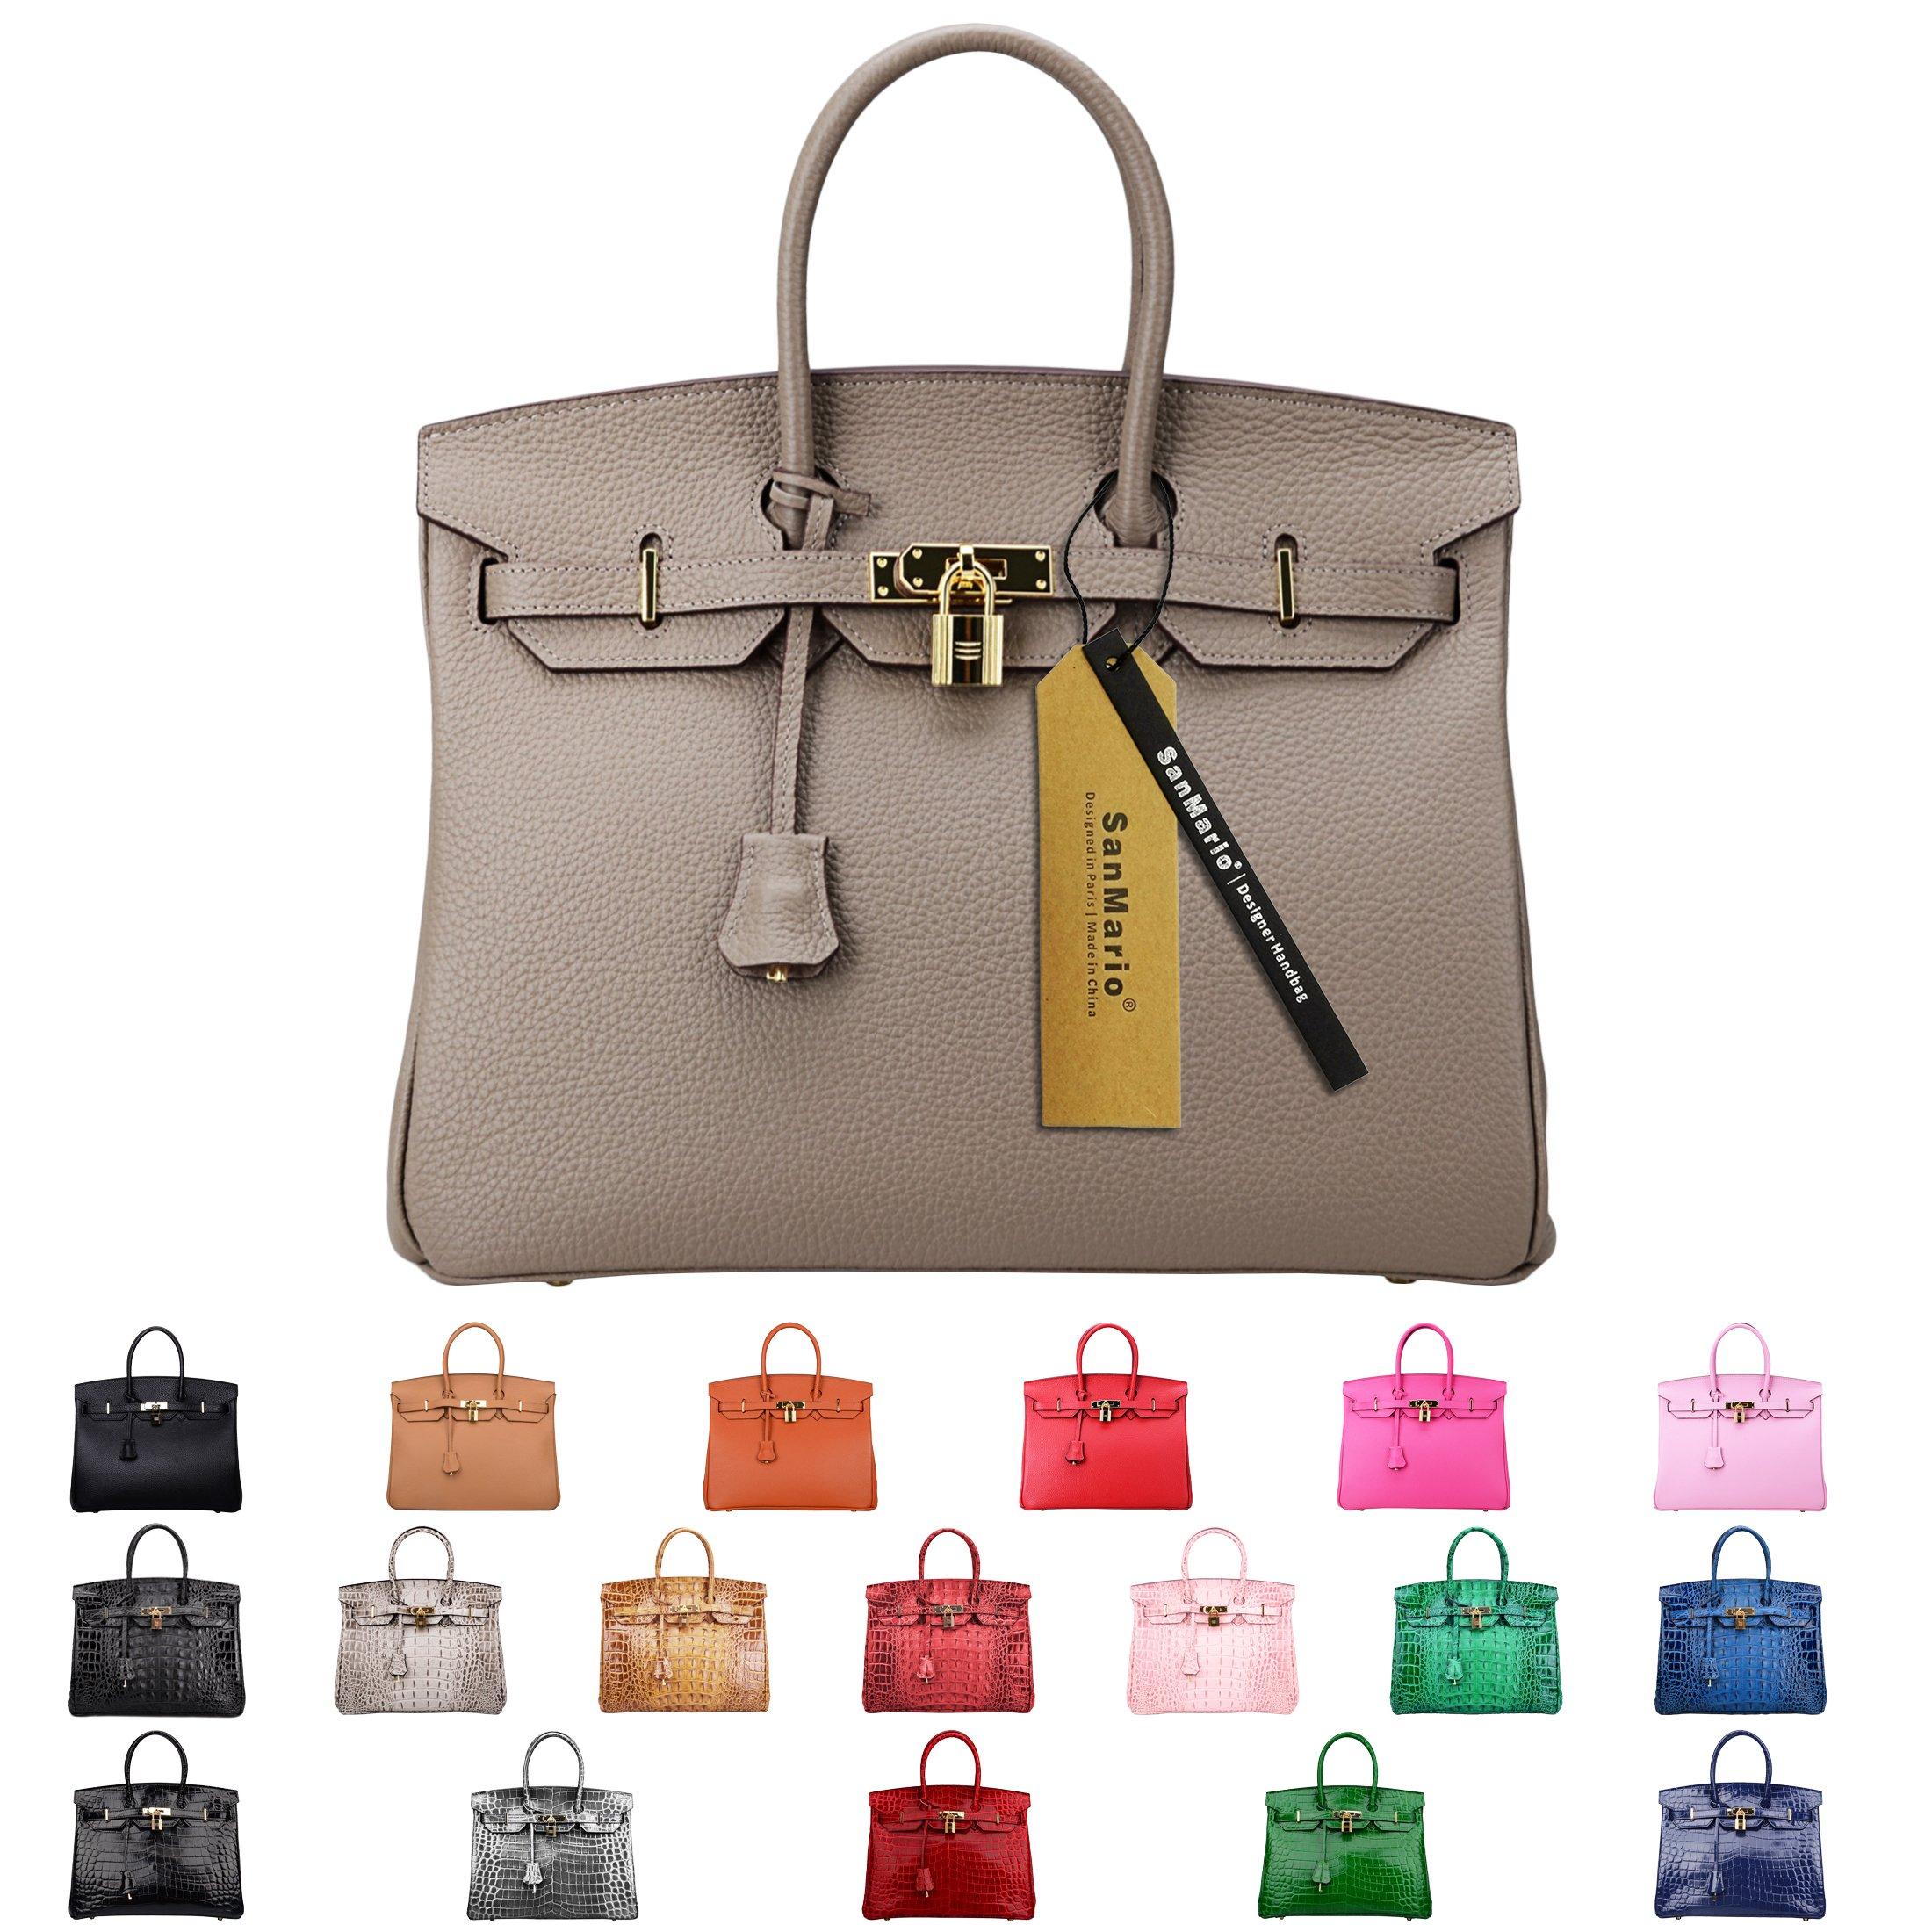 SanMario Designer Handbag 40cm/16'' Oversized Top Handle Padlock Women's Leather Bag with Golden Hardware Taupe/Grey